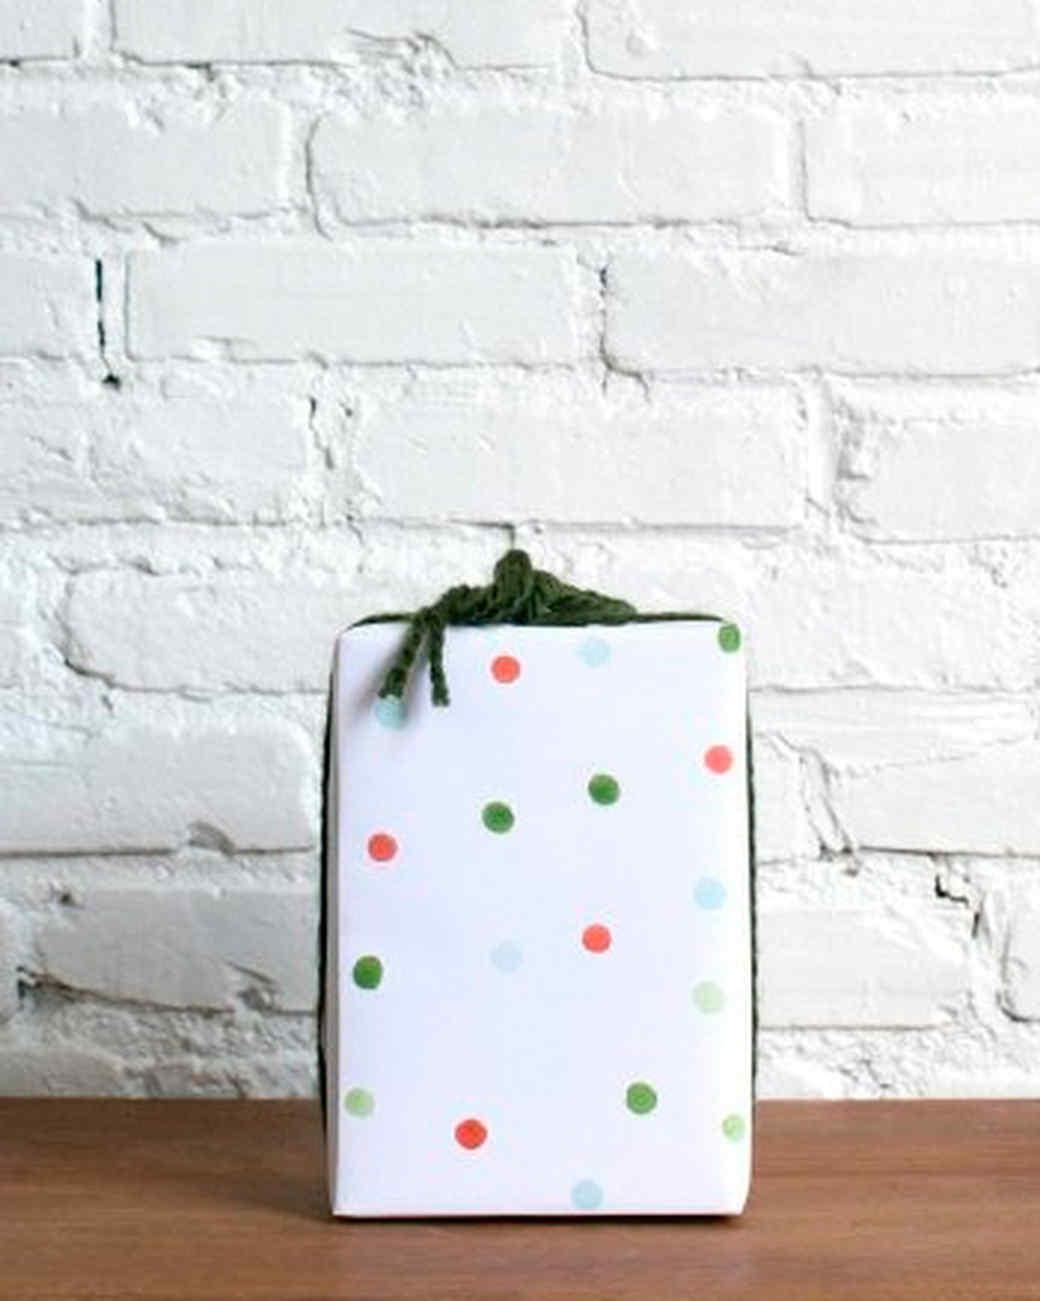 wrapping-paper-am-1115jpg.jpg